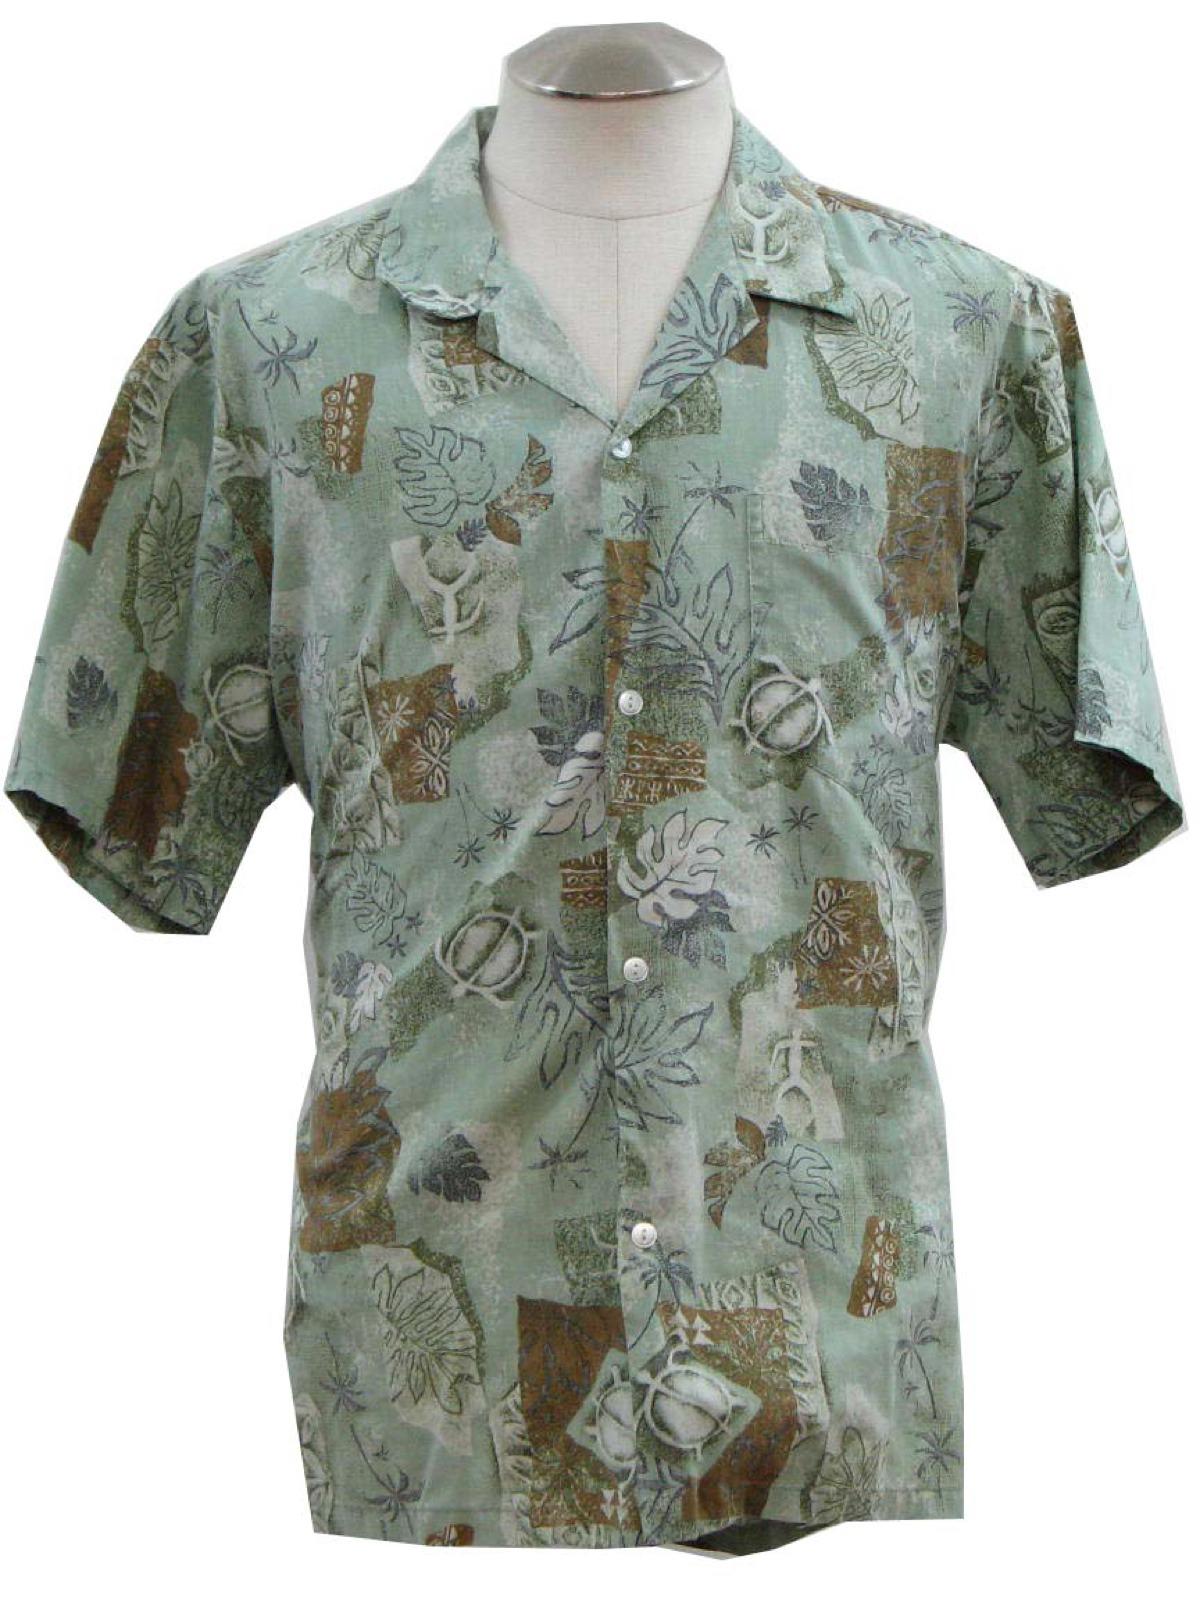 beeff0ba9 Retro Eighties Hawaiian Shirt: 80s -Howie- Mens dusty light green ...